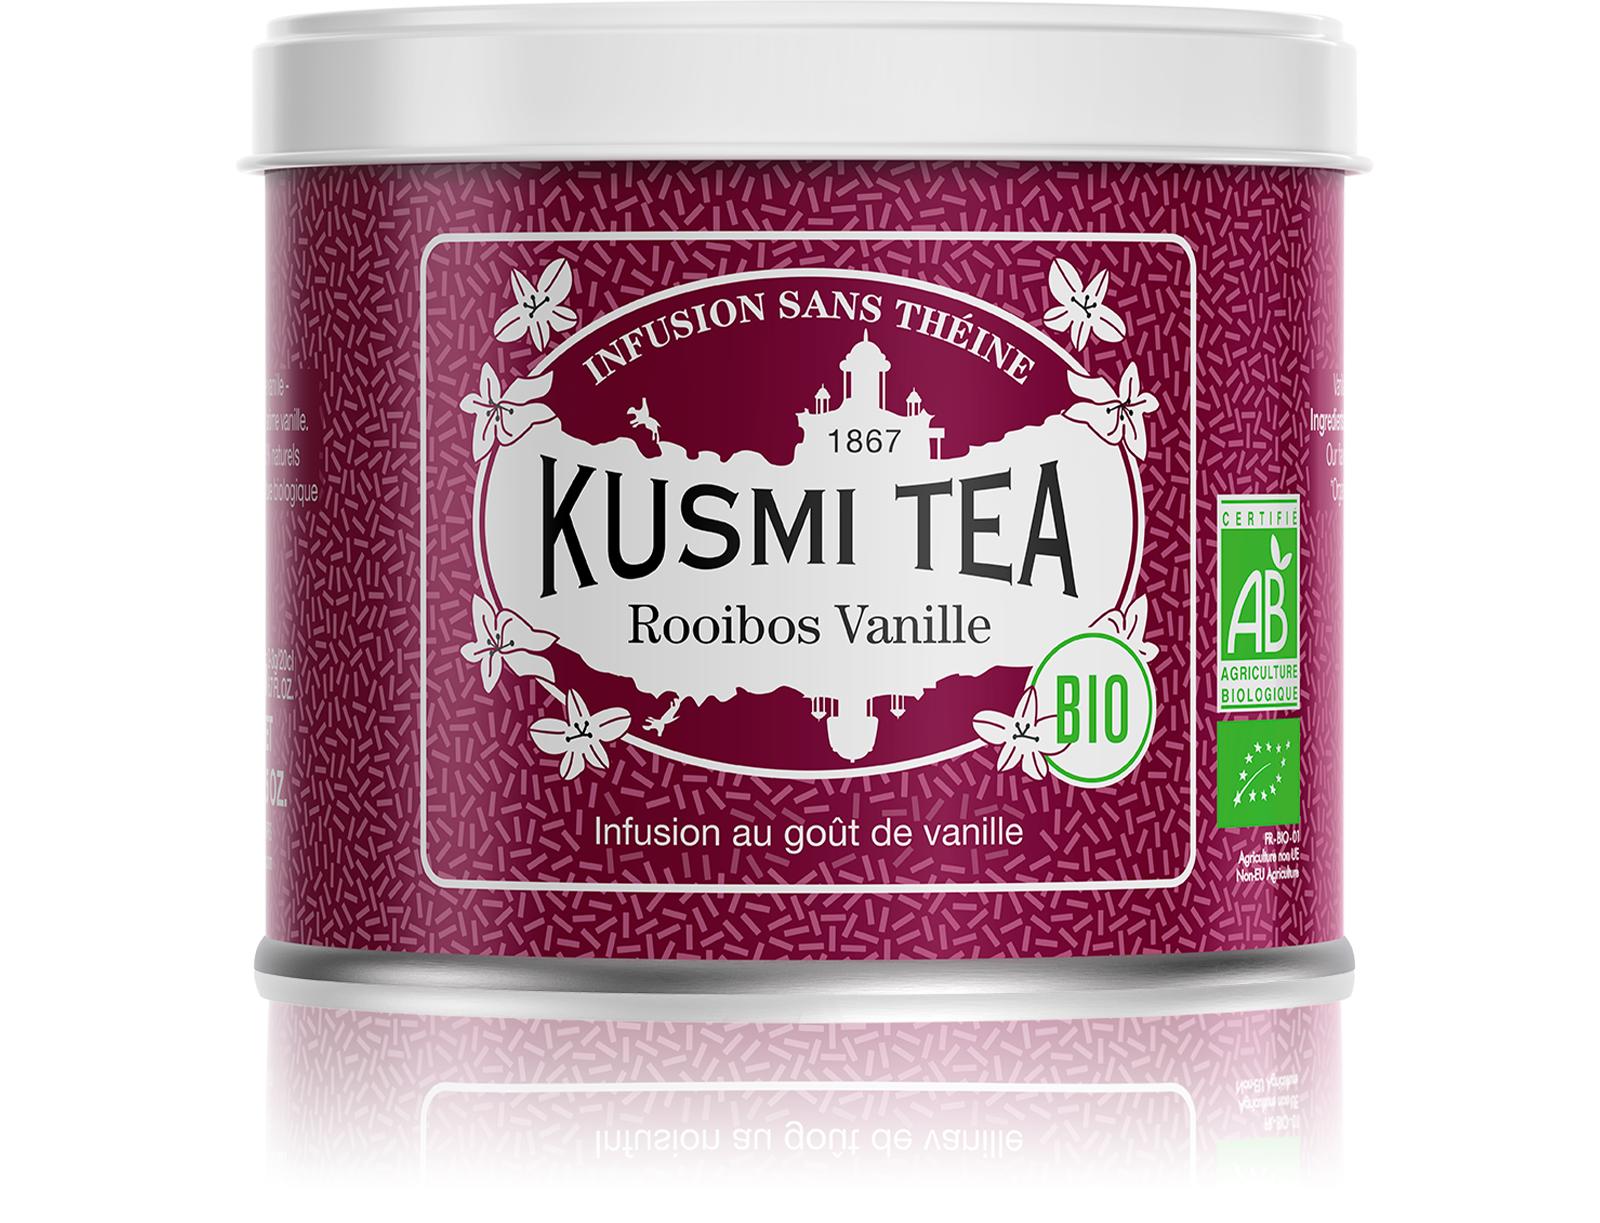 KUSMI TEA Rooibos Vanille (Infusion bio)  Infusion  Kusmi Tea